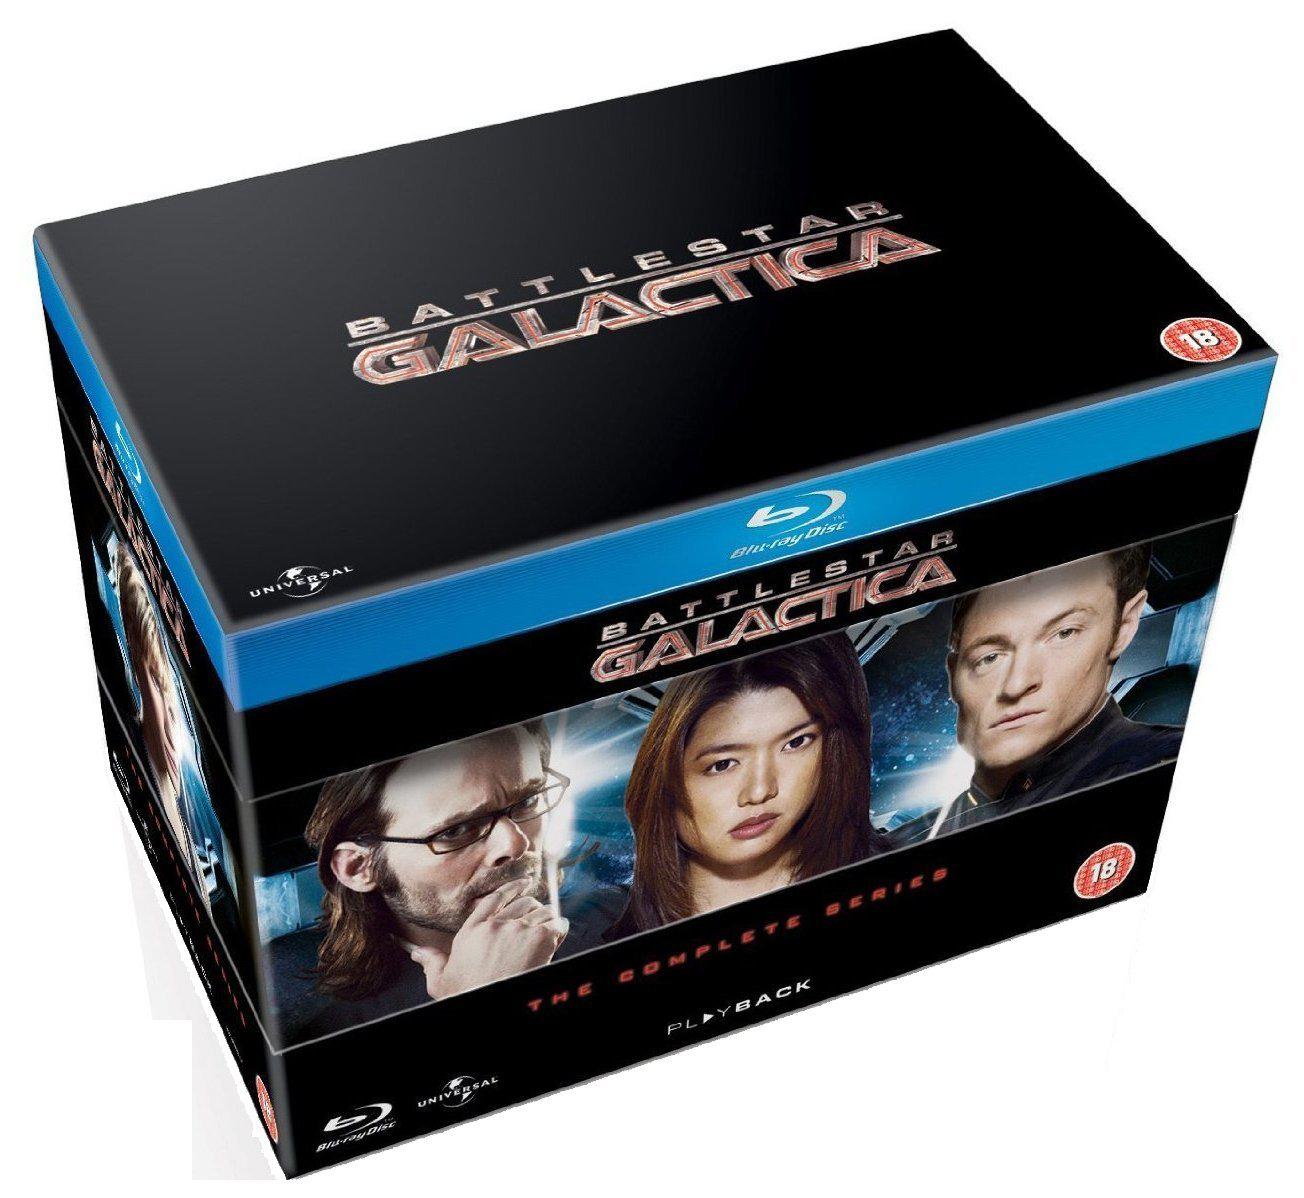 Battlestar Galactica intégrale Blu-ray